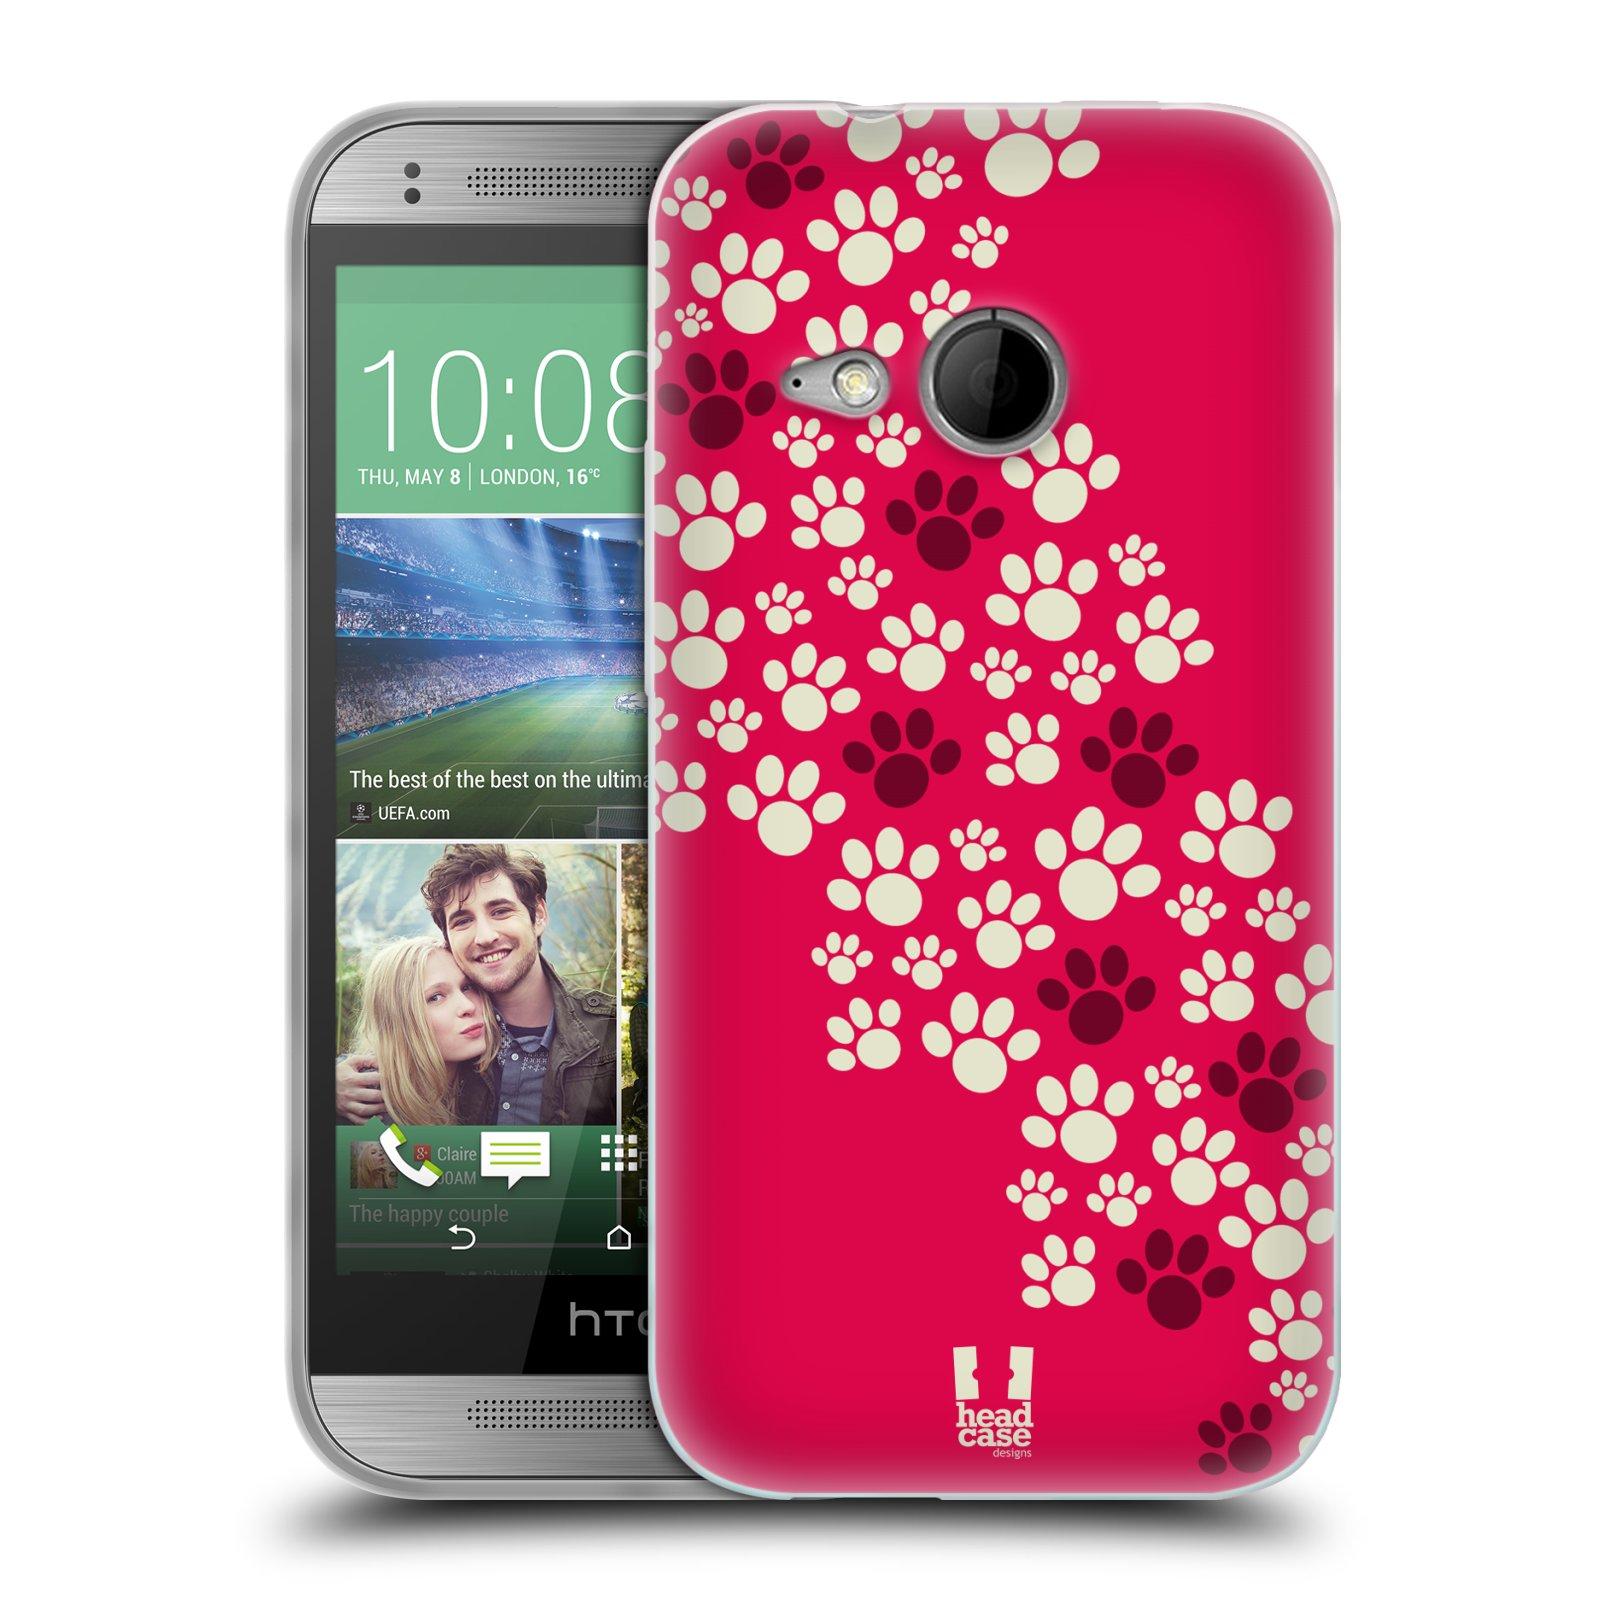 Silikonové pouzdro na mobil HTC ONE Mini 2 HEAD CASE TLAPKY RŮŽOVÉ (Silikonový kryt či obal na mobilní telefon HTC ONE Mini 2)